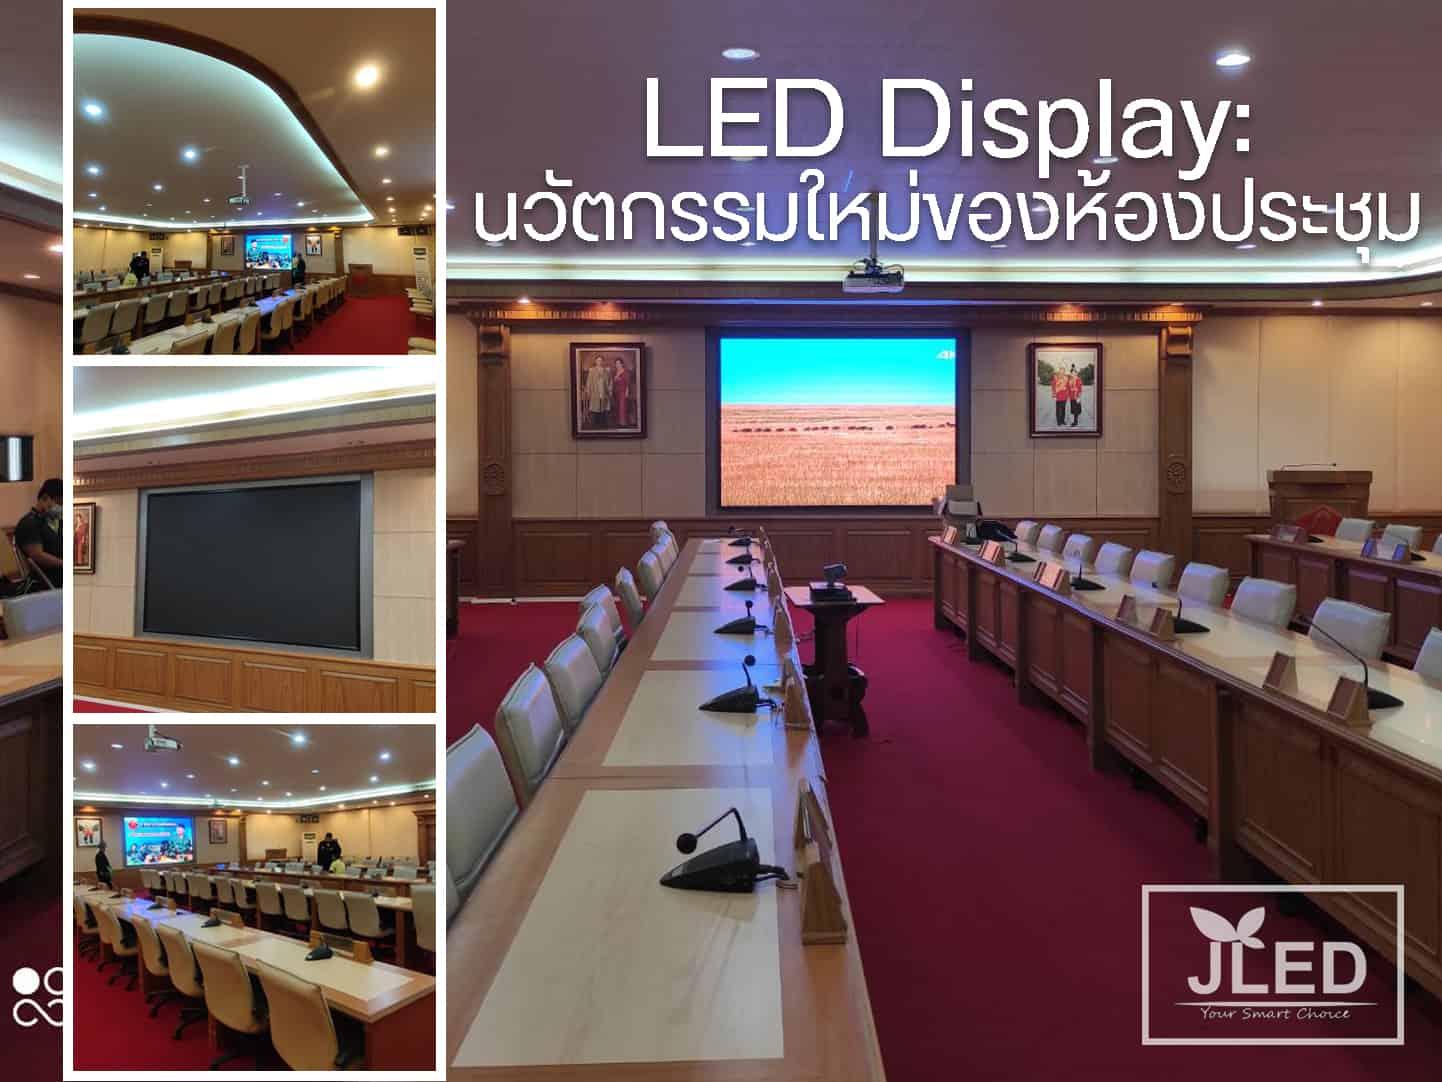 LED Display นวัตกรรมใหม่ของห้องประชุม jled